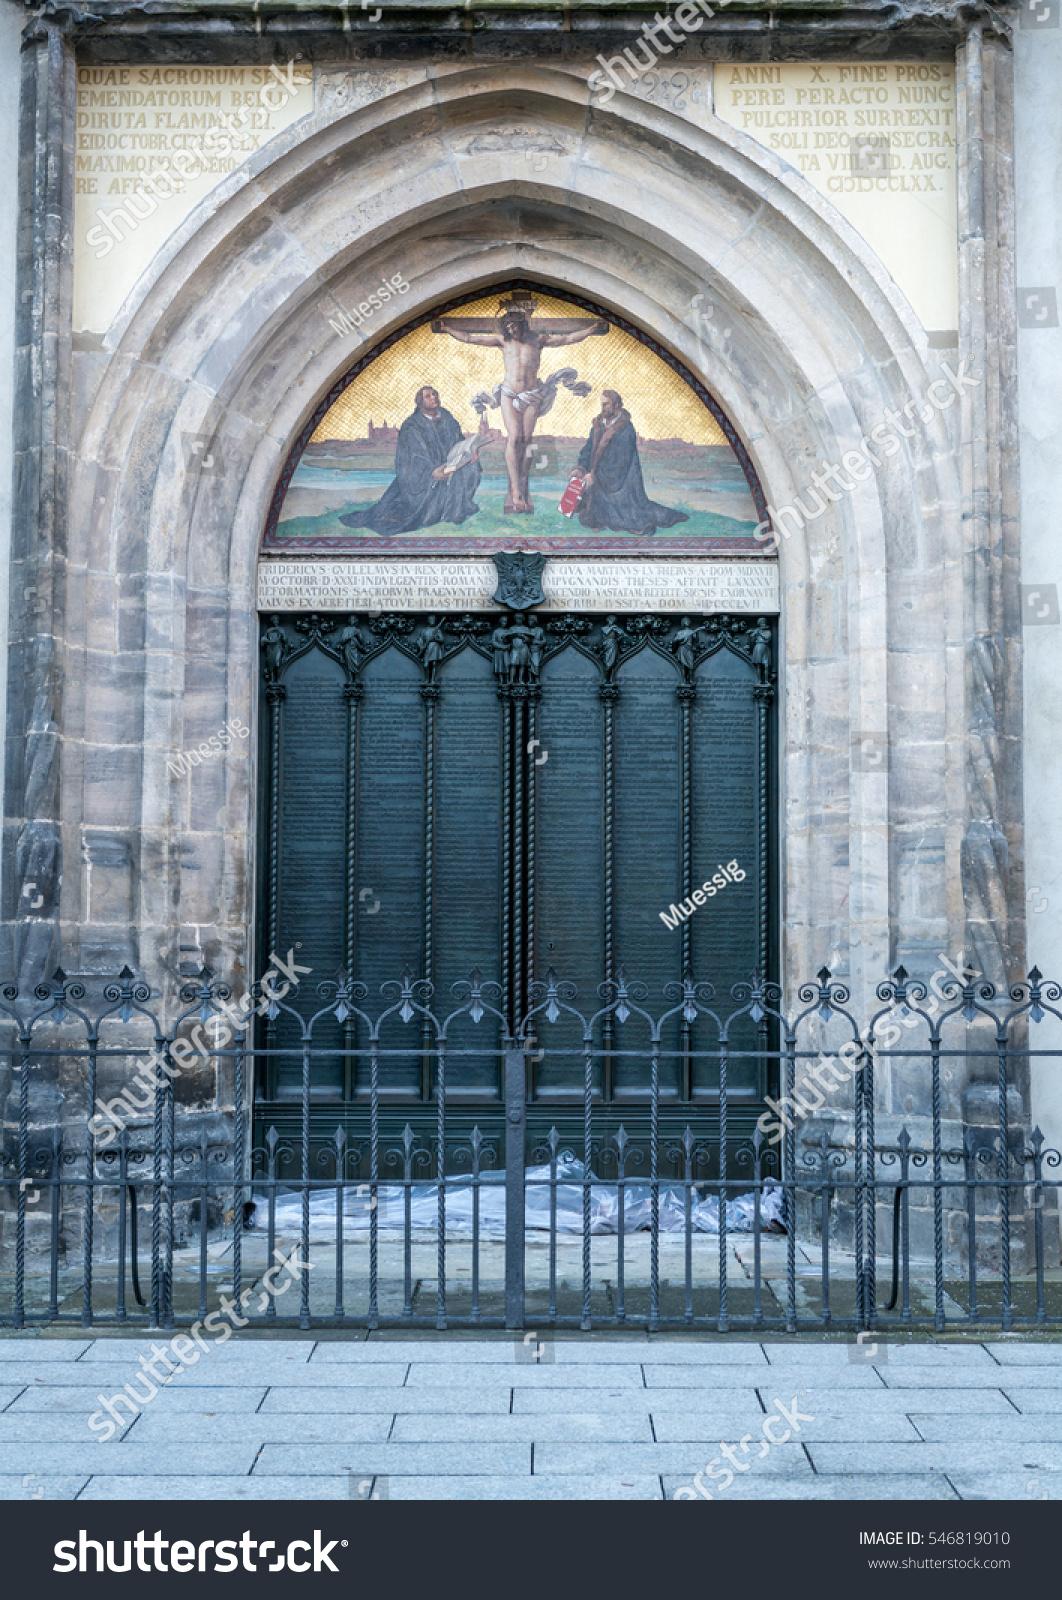 Decorating martin luther church door photos : Wittenberg Famous Door All Saints Church Stock Photo 546819010 ...